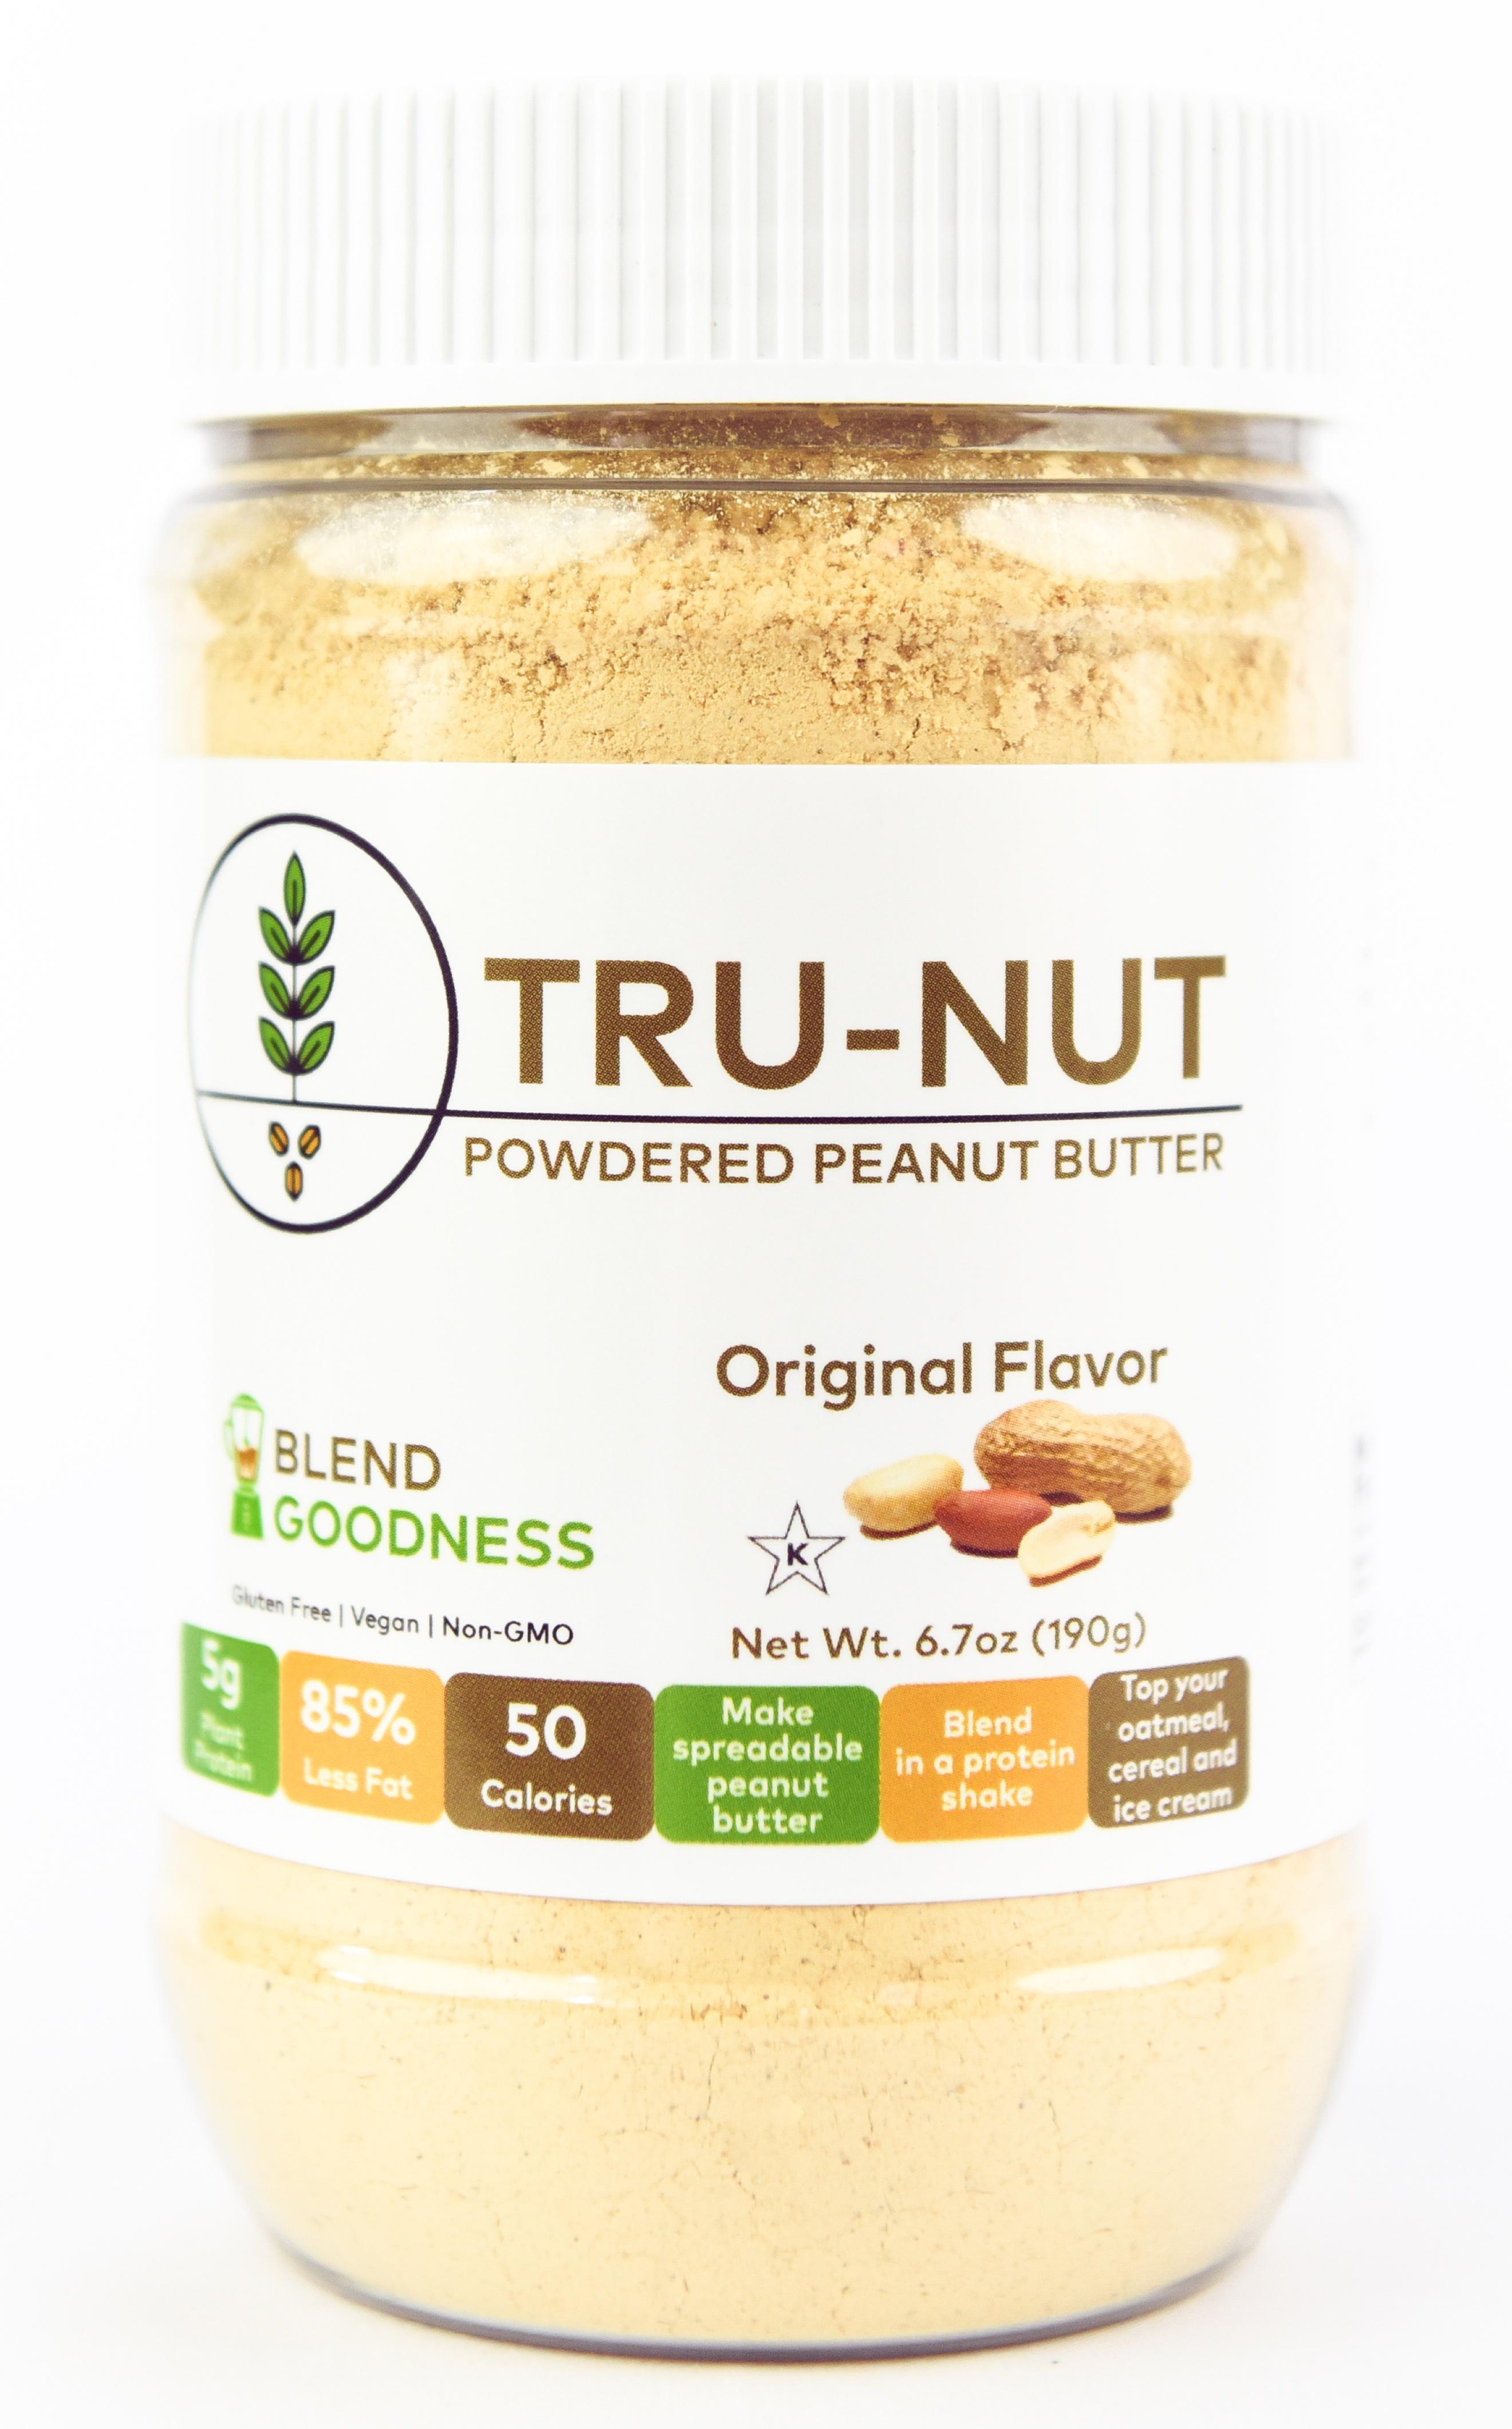 Powdered Peanut Butter